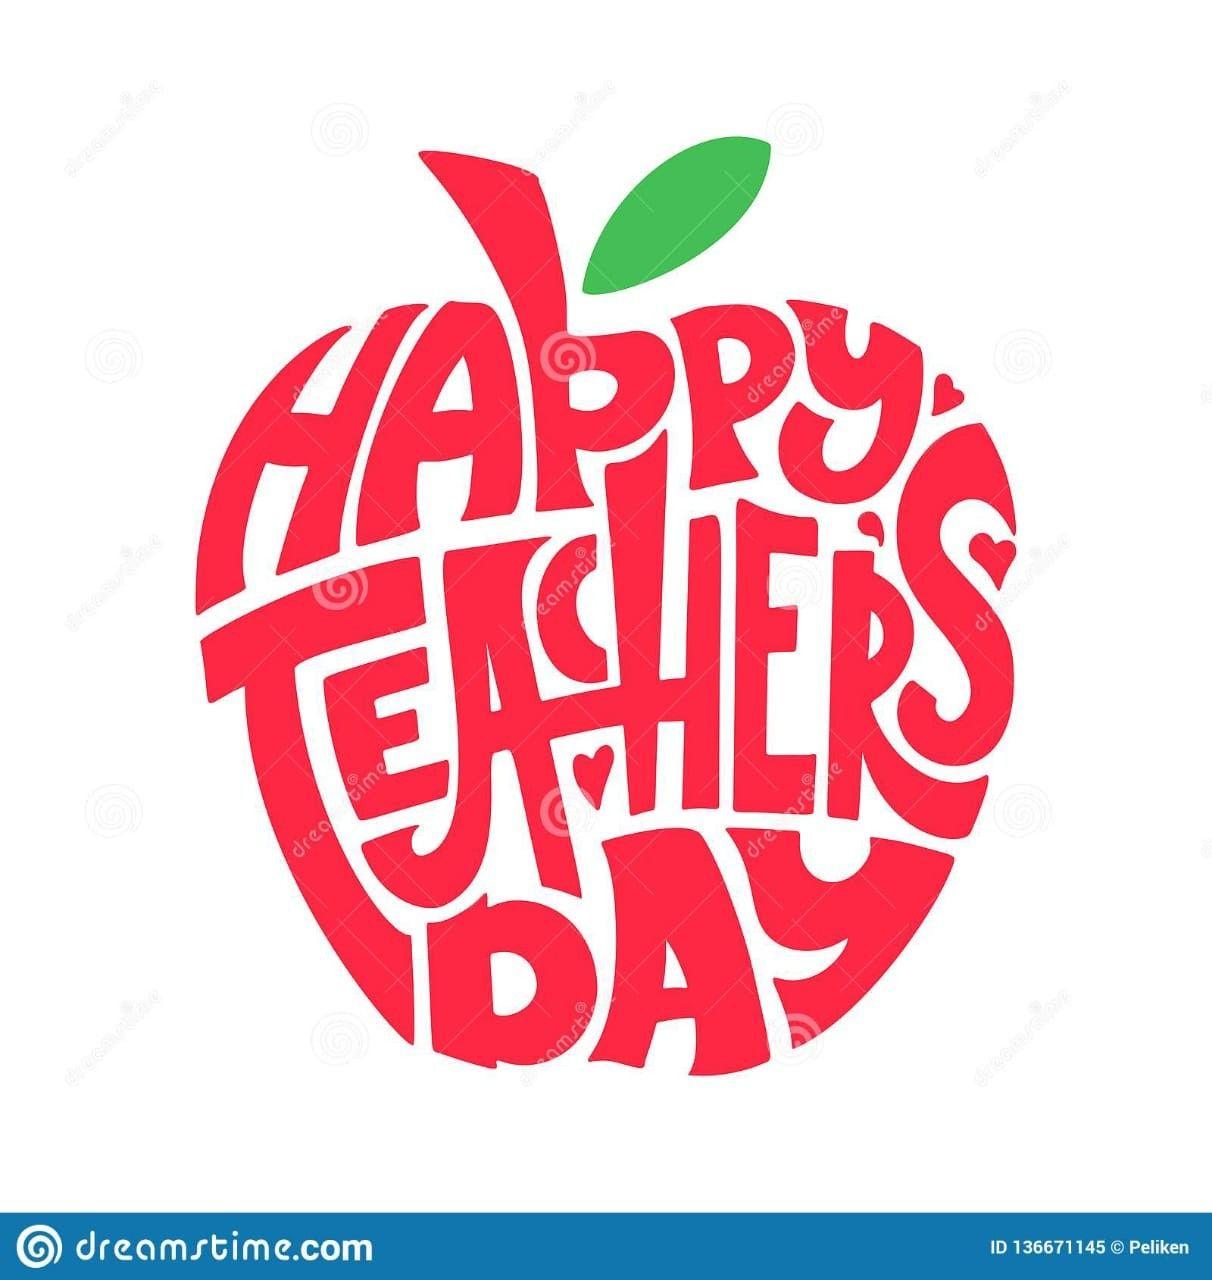 Pin By Aminath Ajnaza On Happy Teacher S Day Happy Teachers Day Card Happy Teachers Day Teachers Day Card